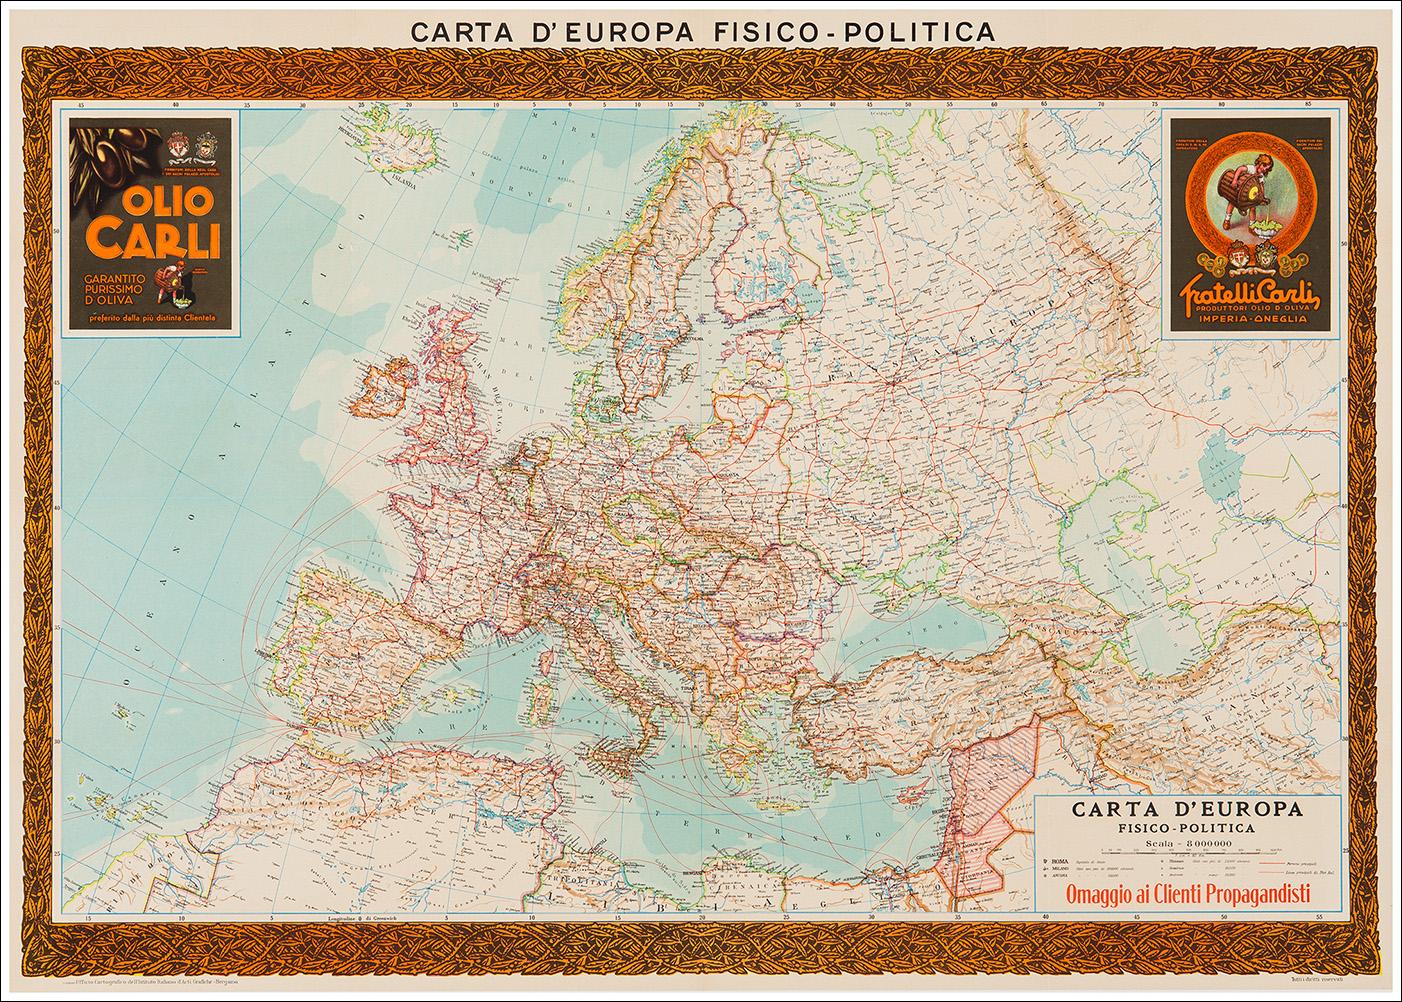 Cartina Europa 1938.Olio D Oliva Fratelli Carli Oneglia Imperia L Image Gallery